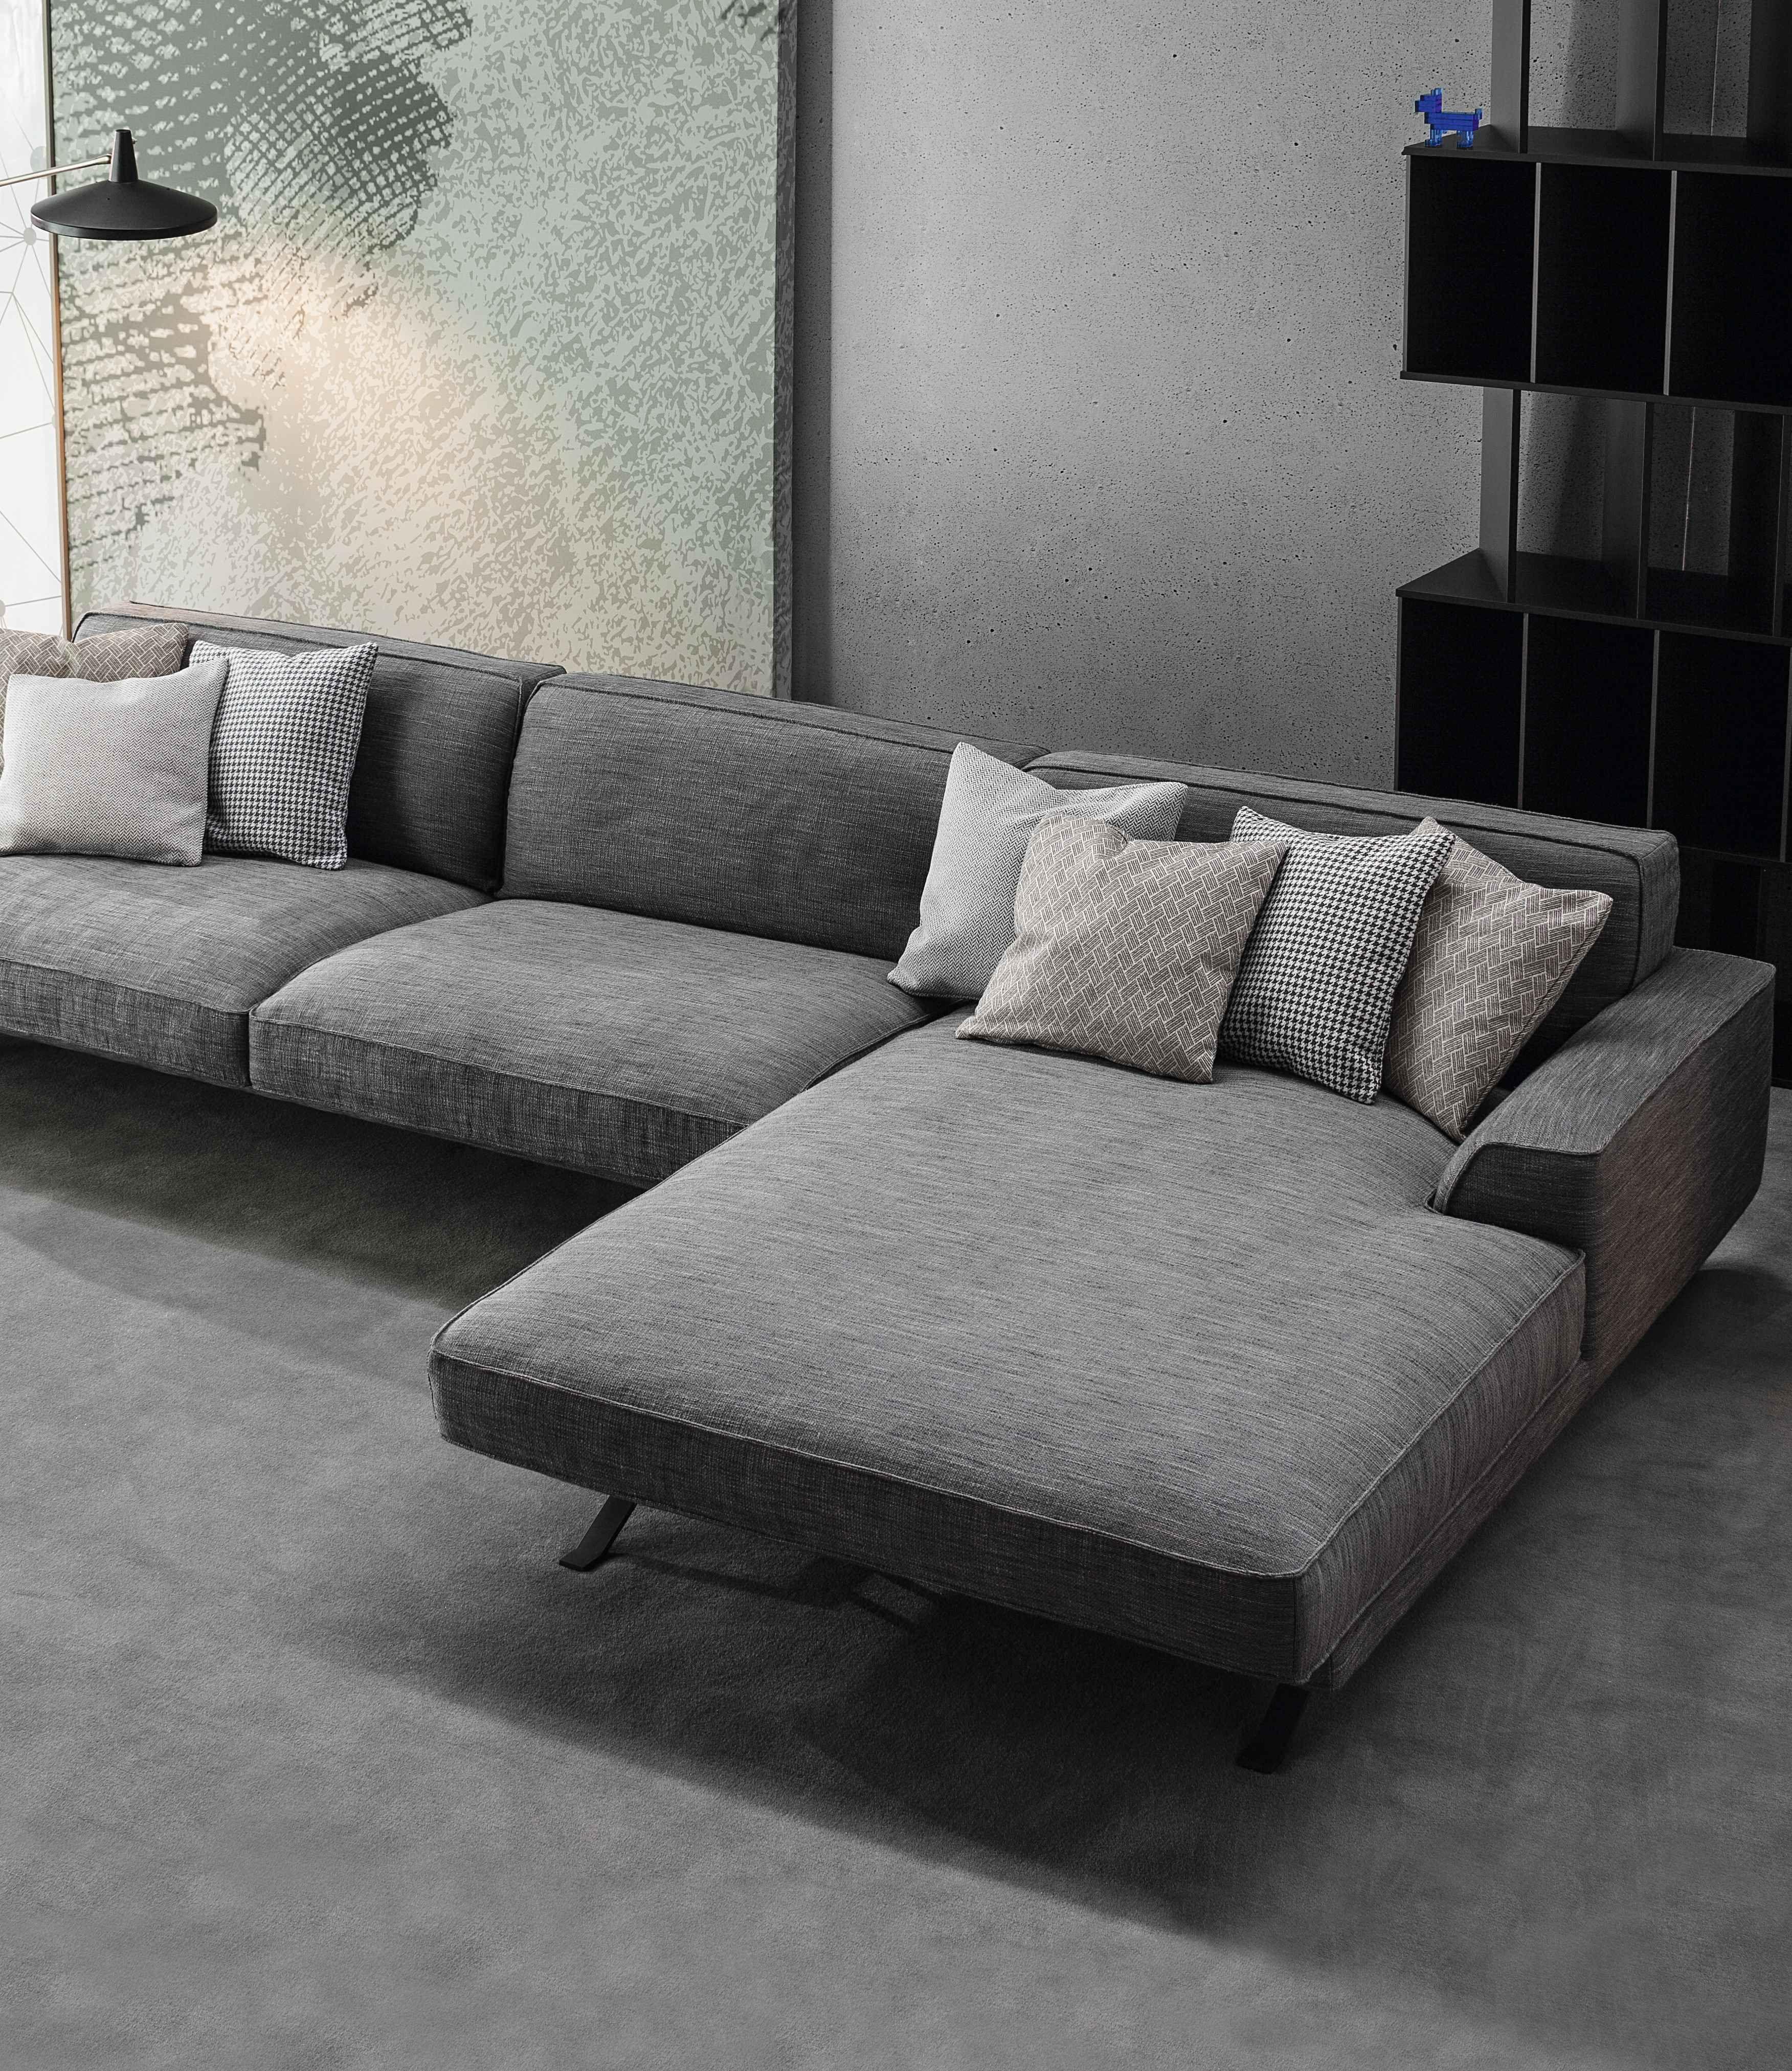 Bonaldo_sofa Slab Design divano, Idee arredamento